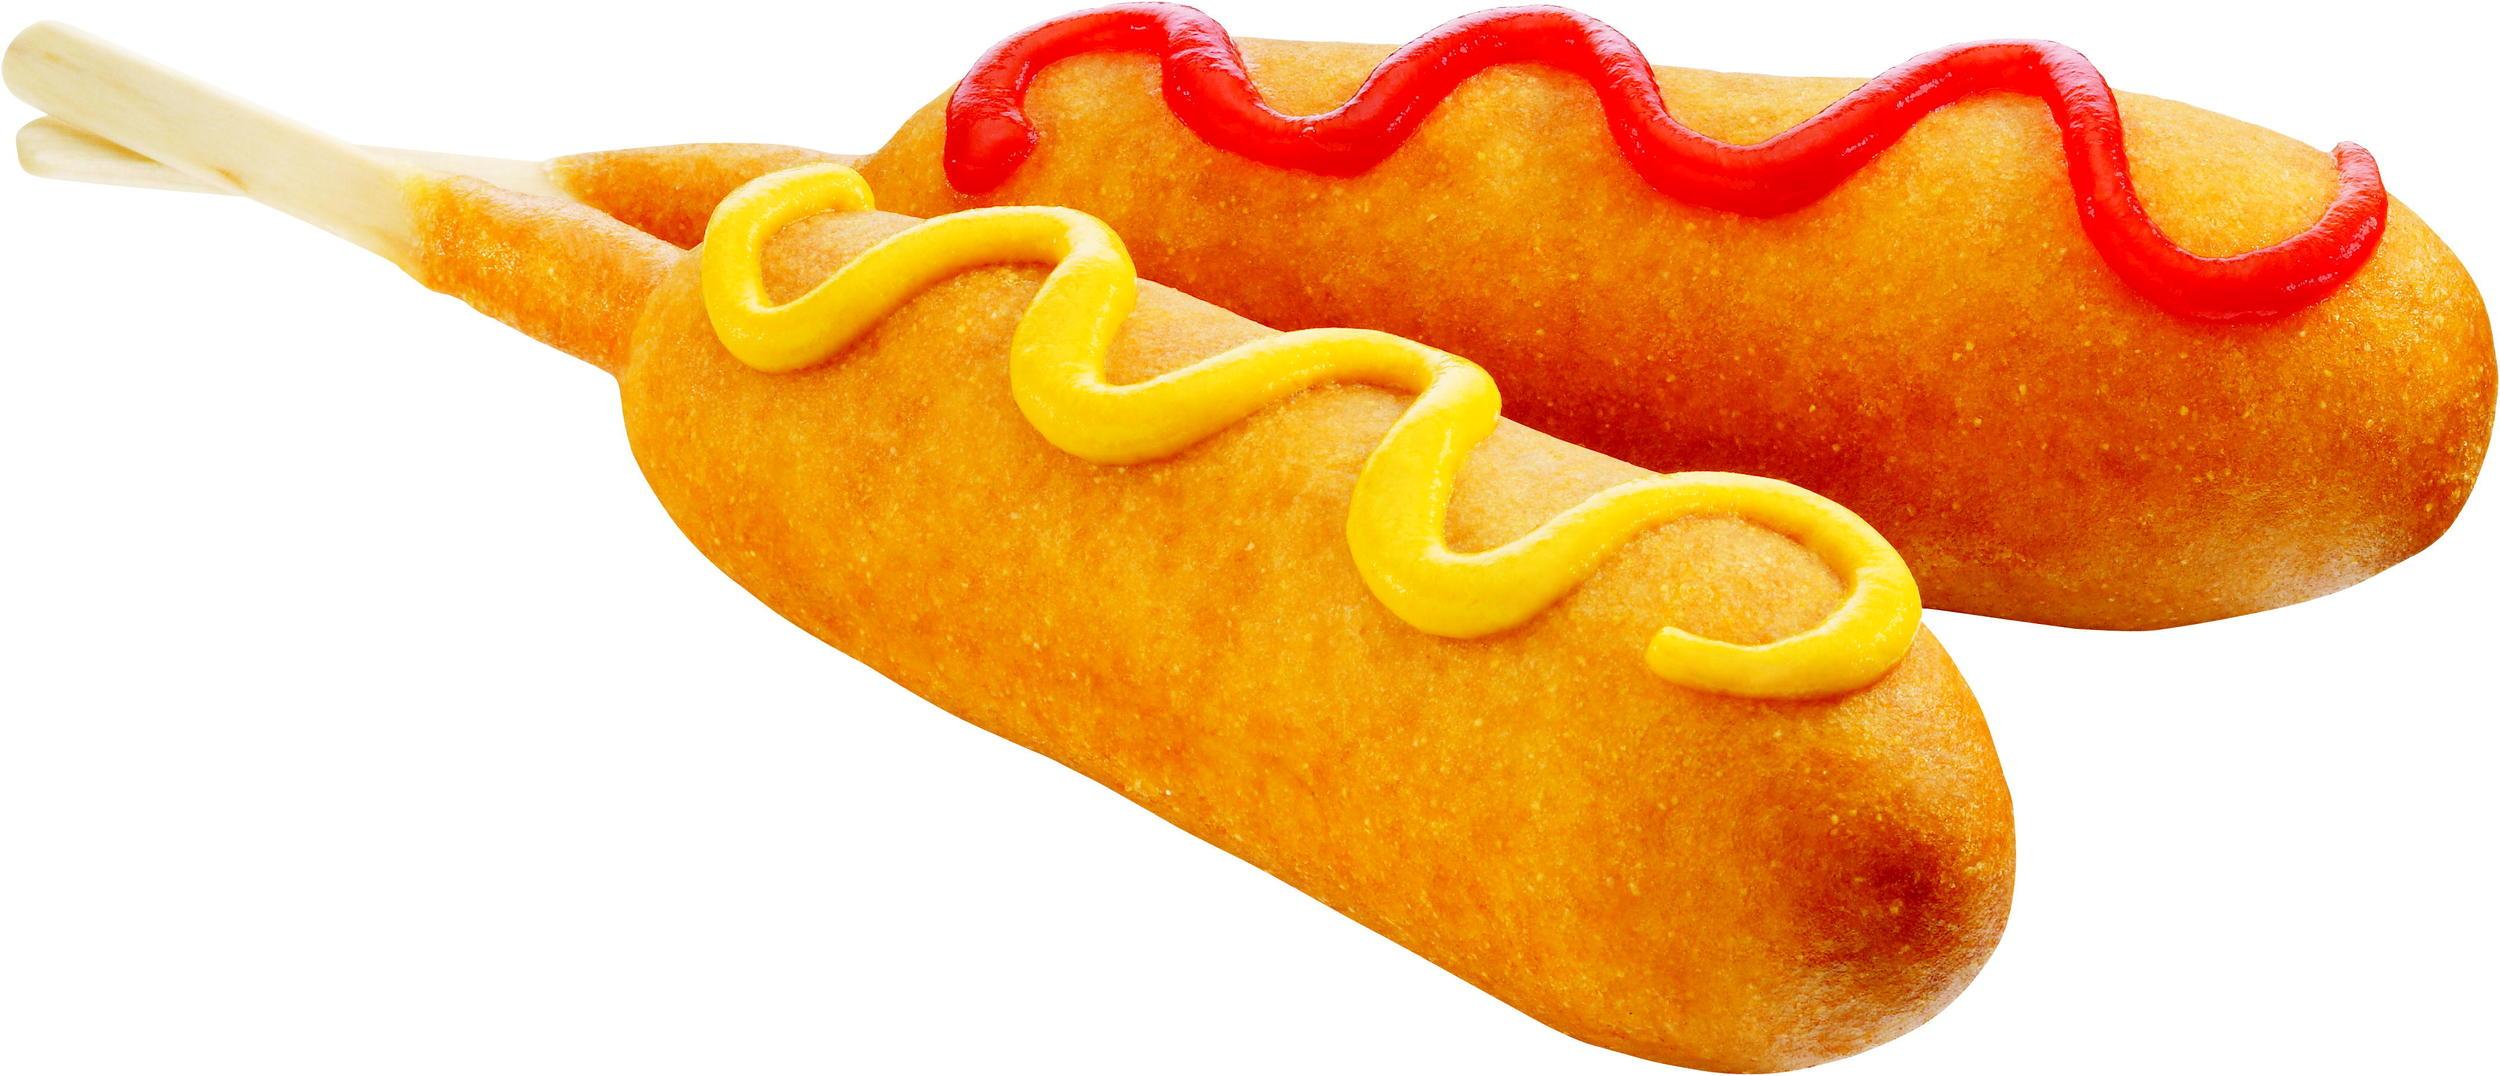 corndog-ketchup-26-mustard-cob.jpg